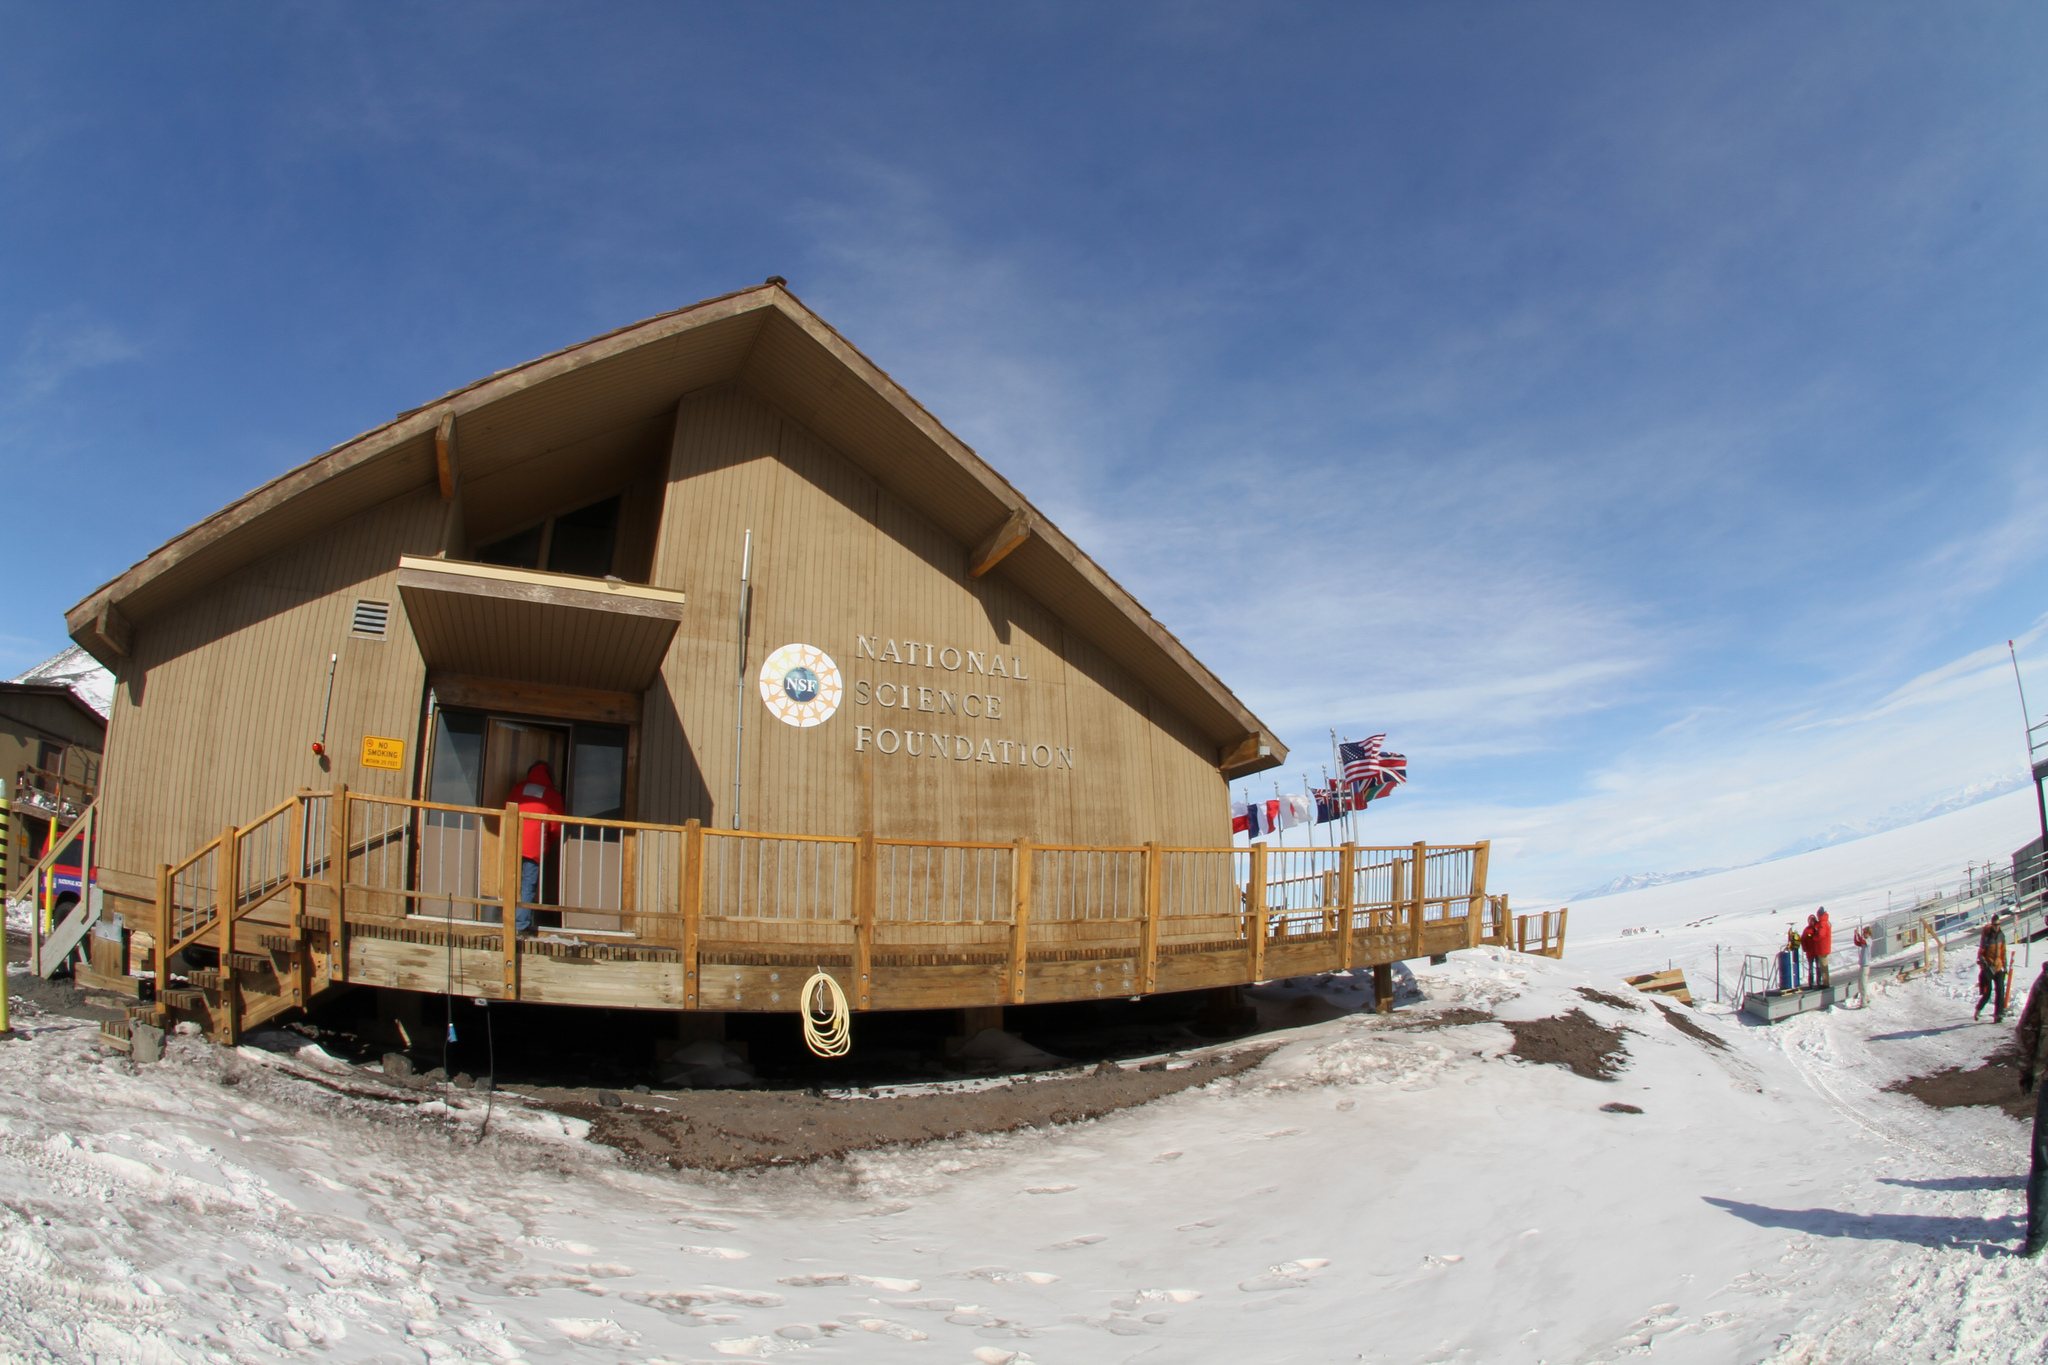 NSF Chalet at McMurdo